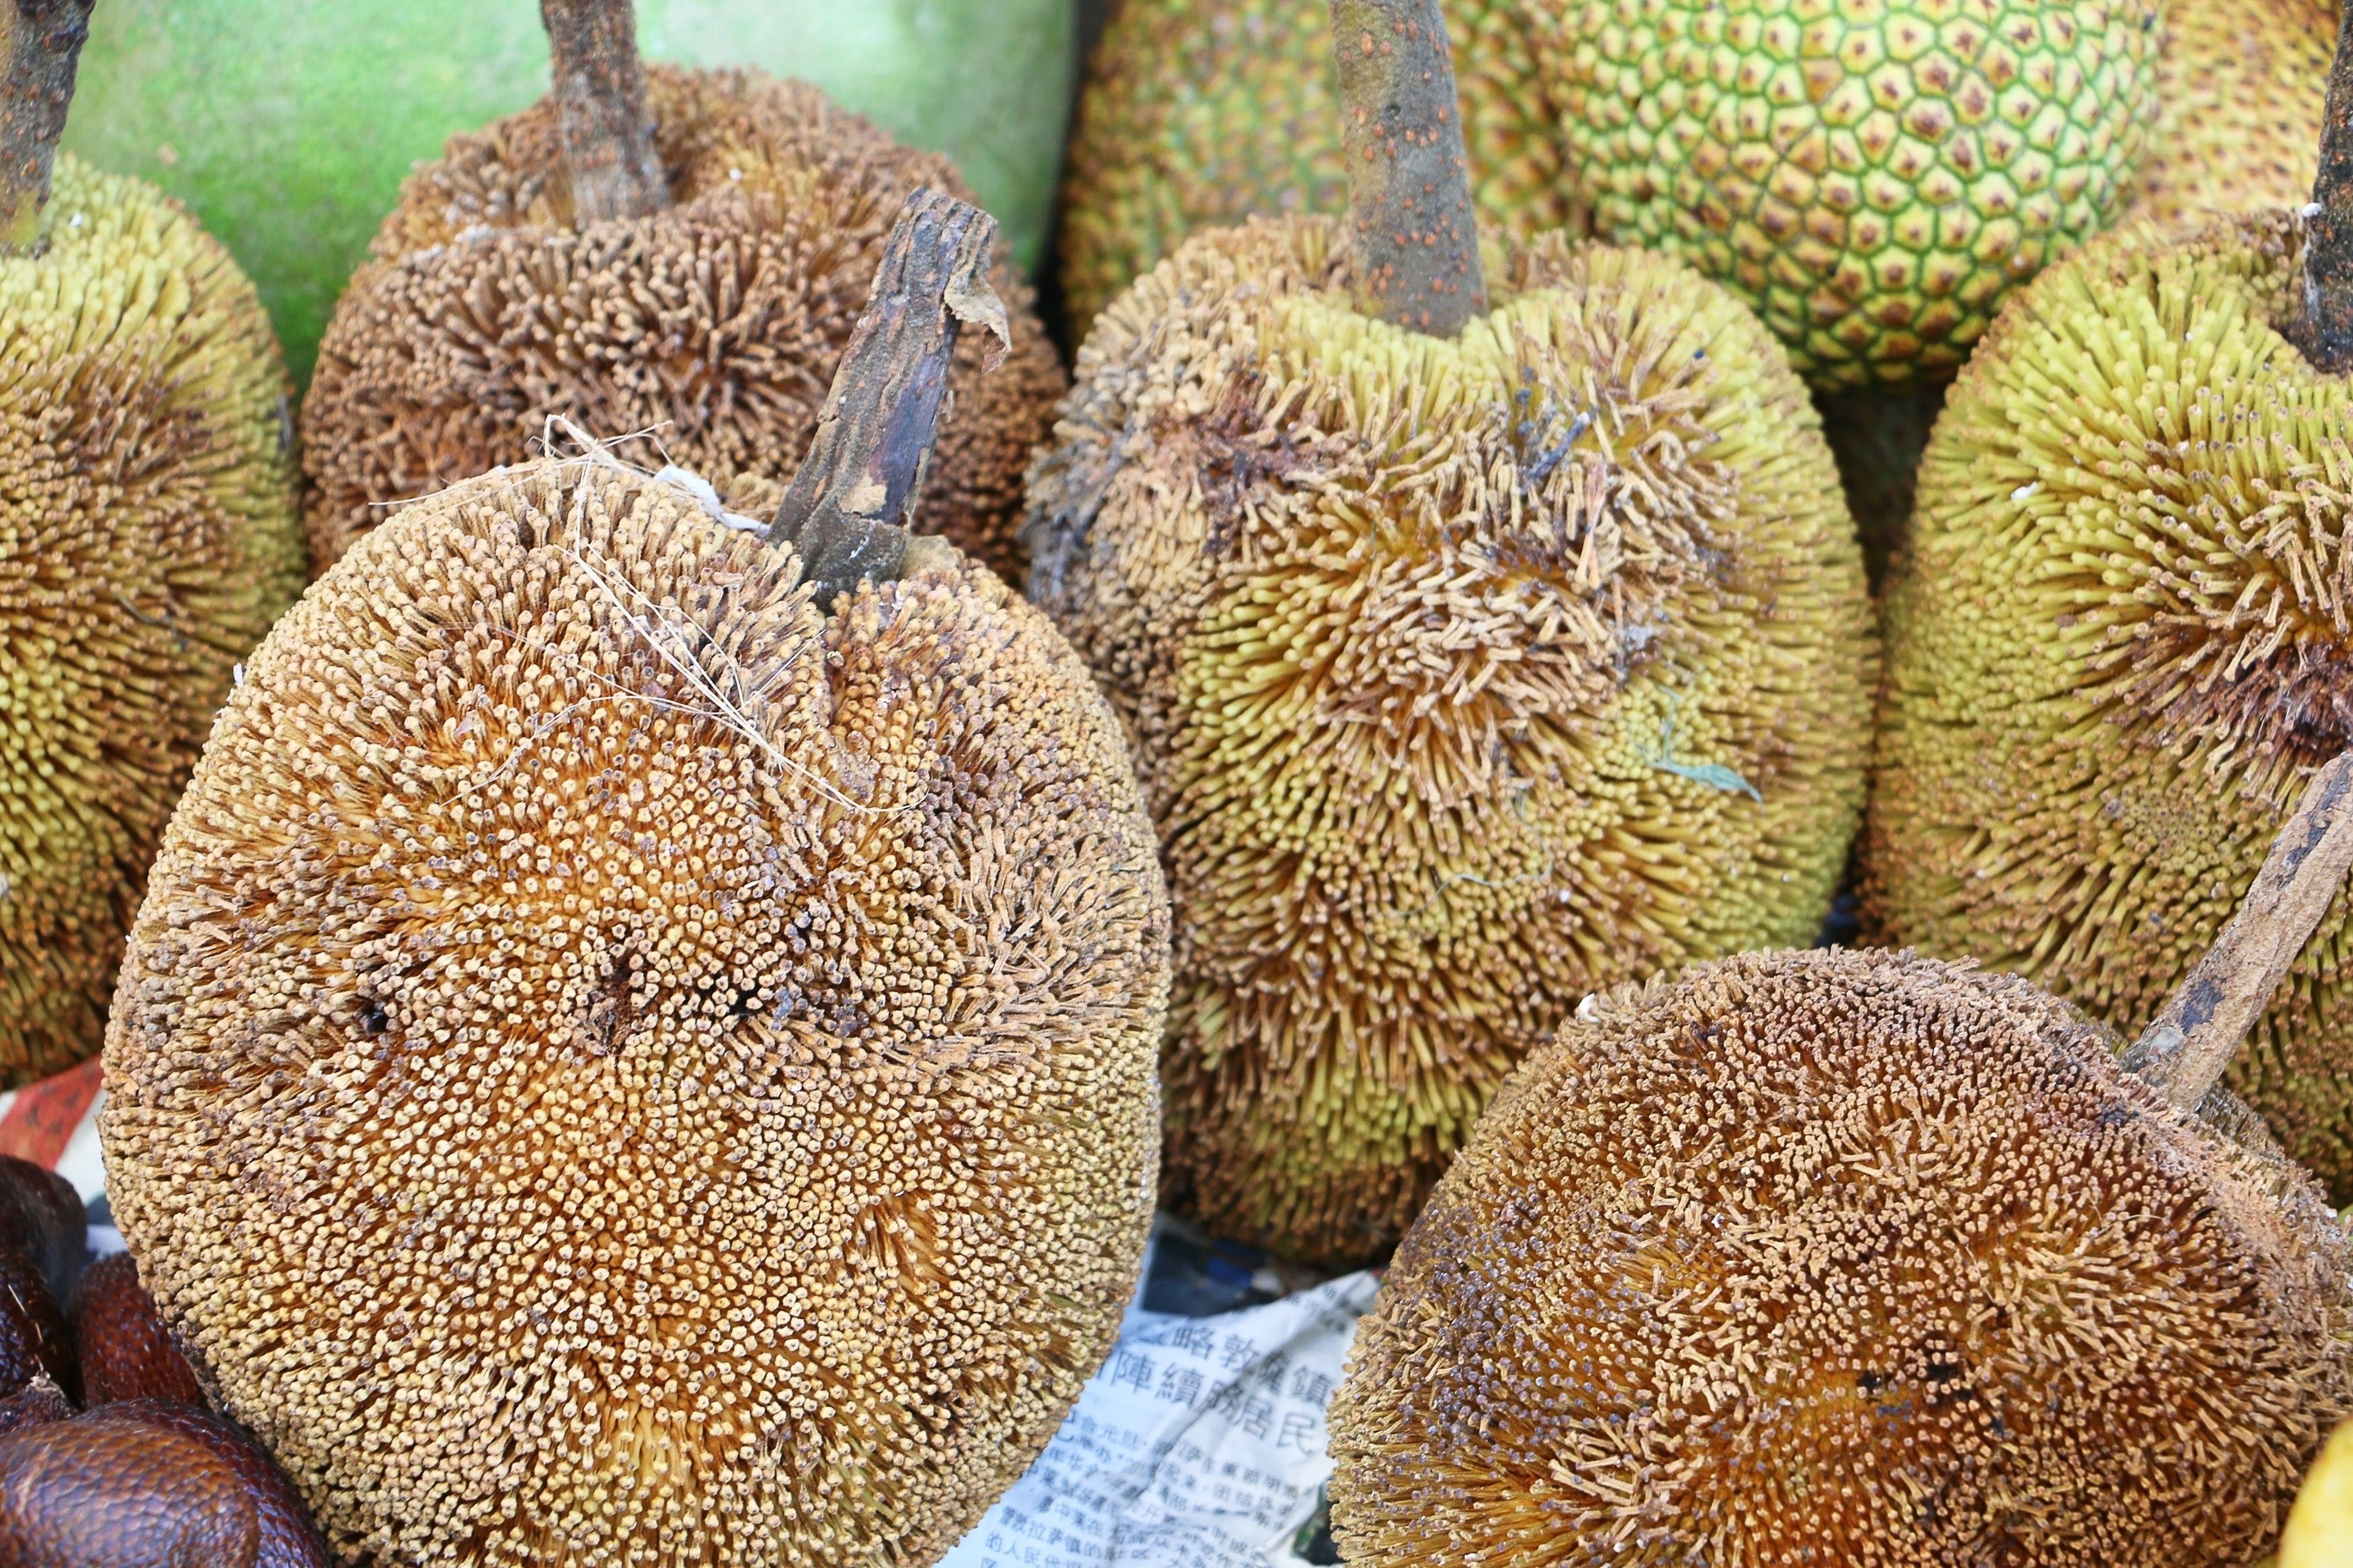 Buah Tarap or Artocarpus odoratissimus